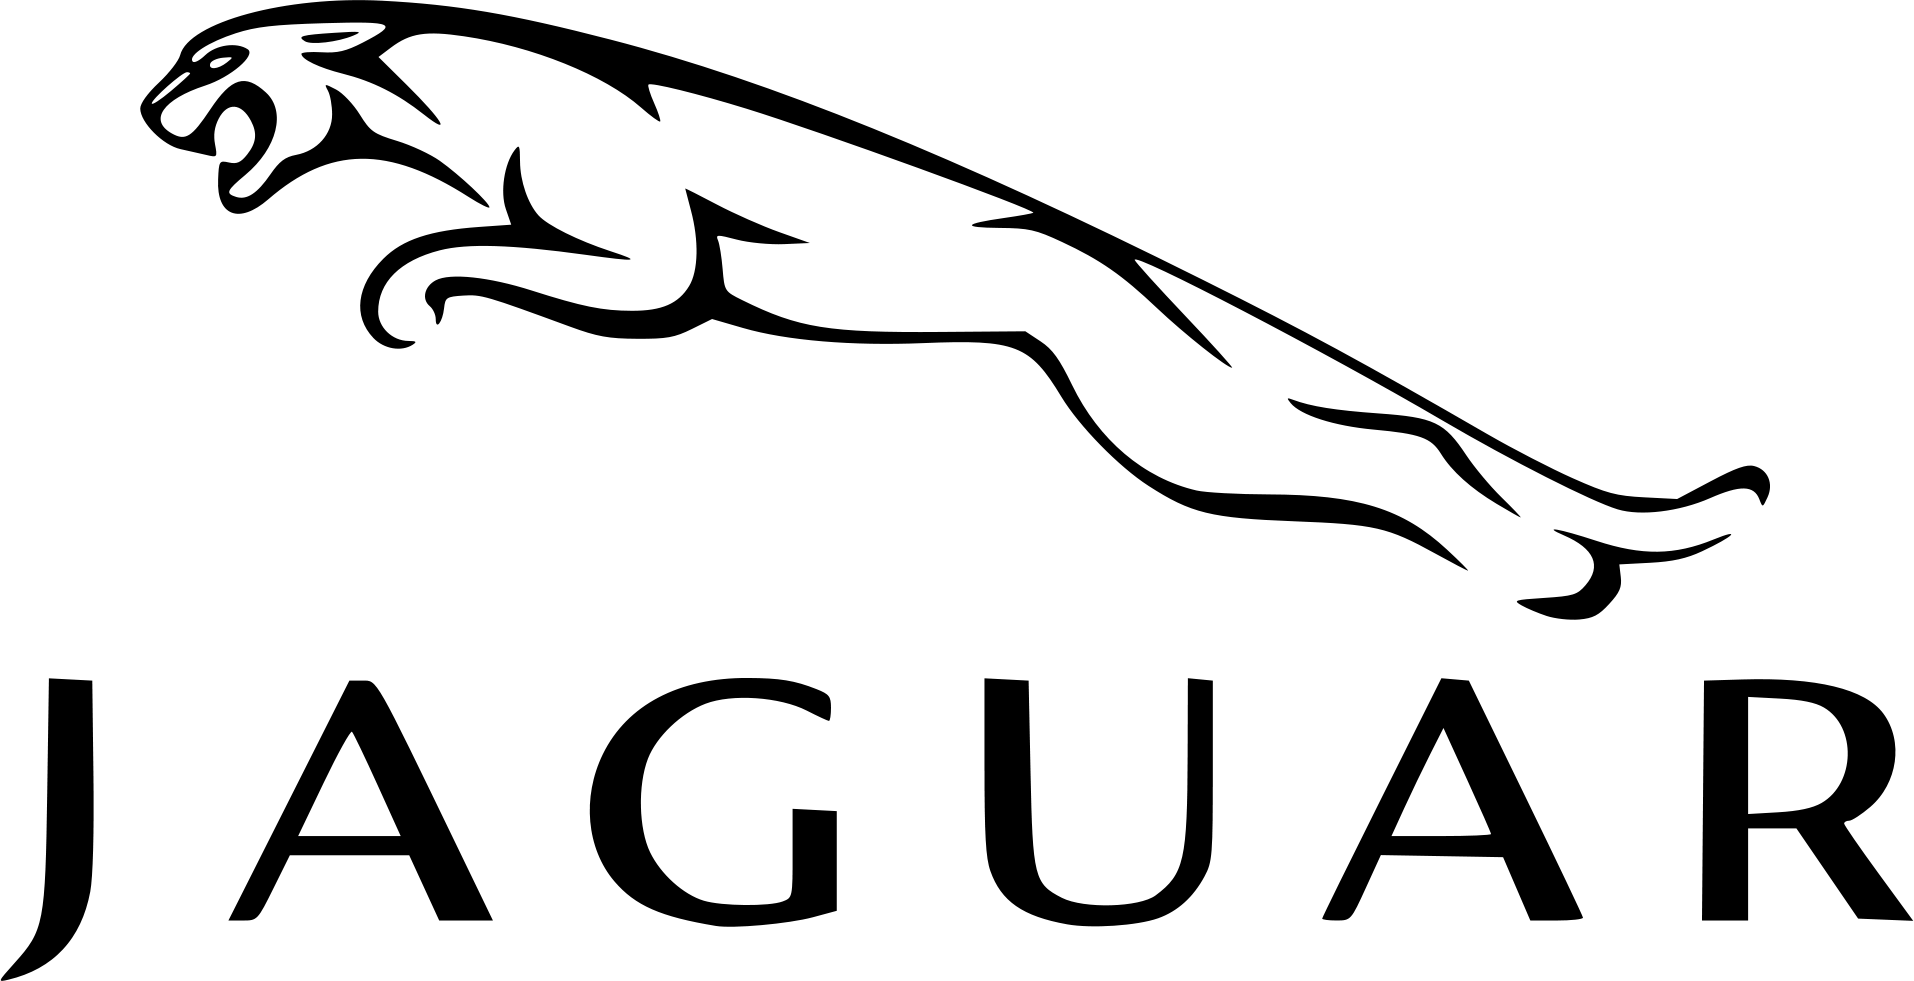 Jaguar logo black and white PNG Clipart - Jaguar PNG Black And White